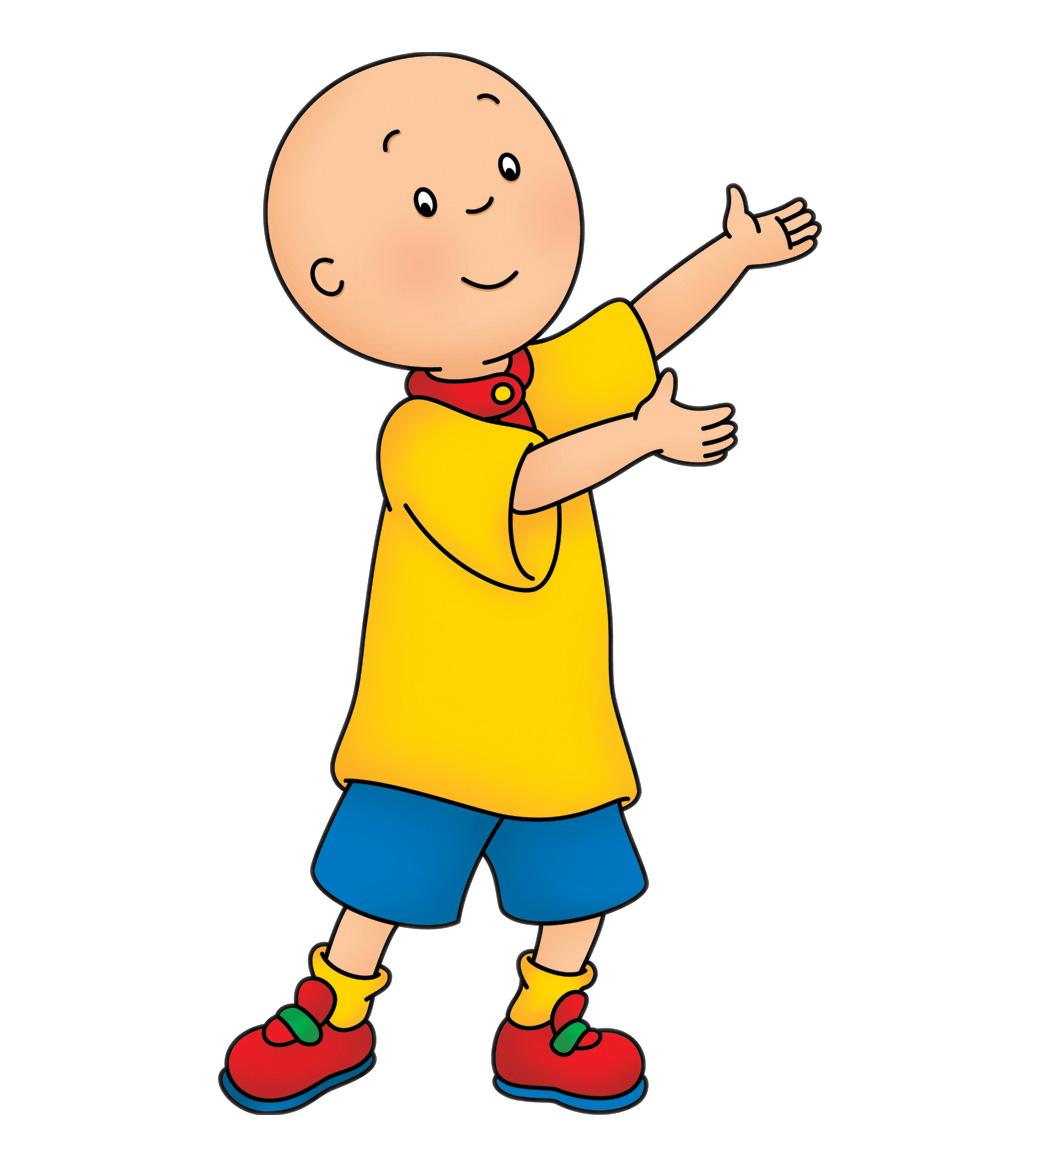 caillou wiki character fandom wikia